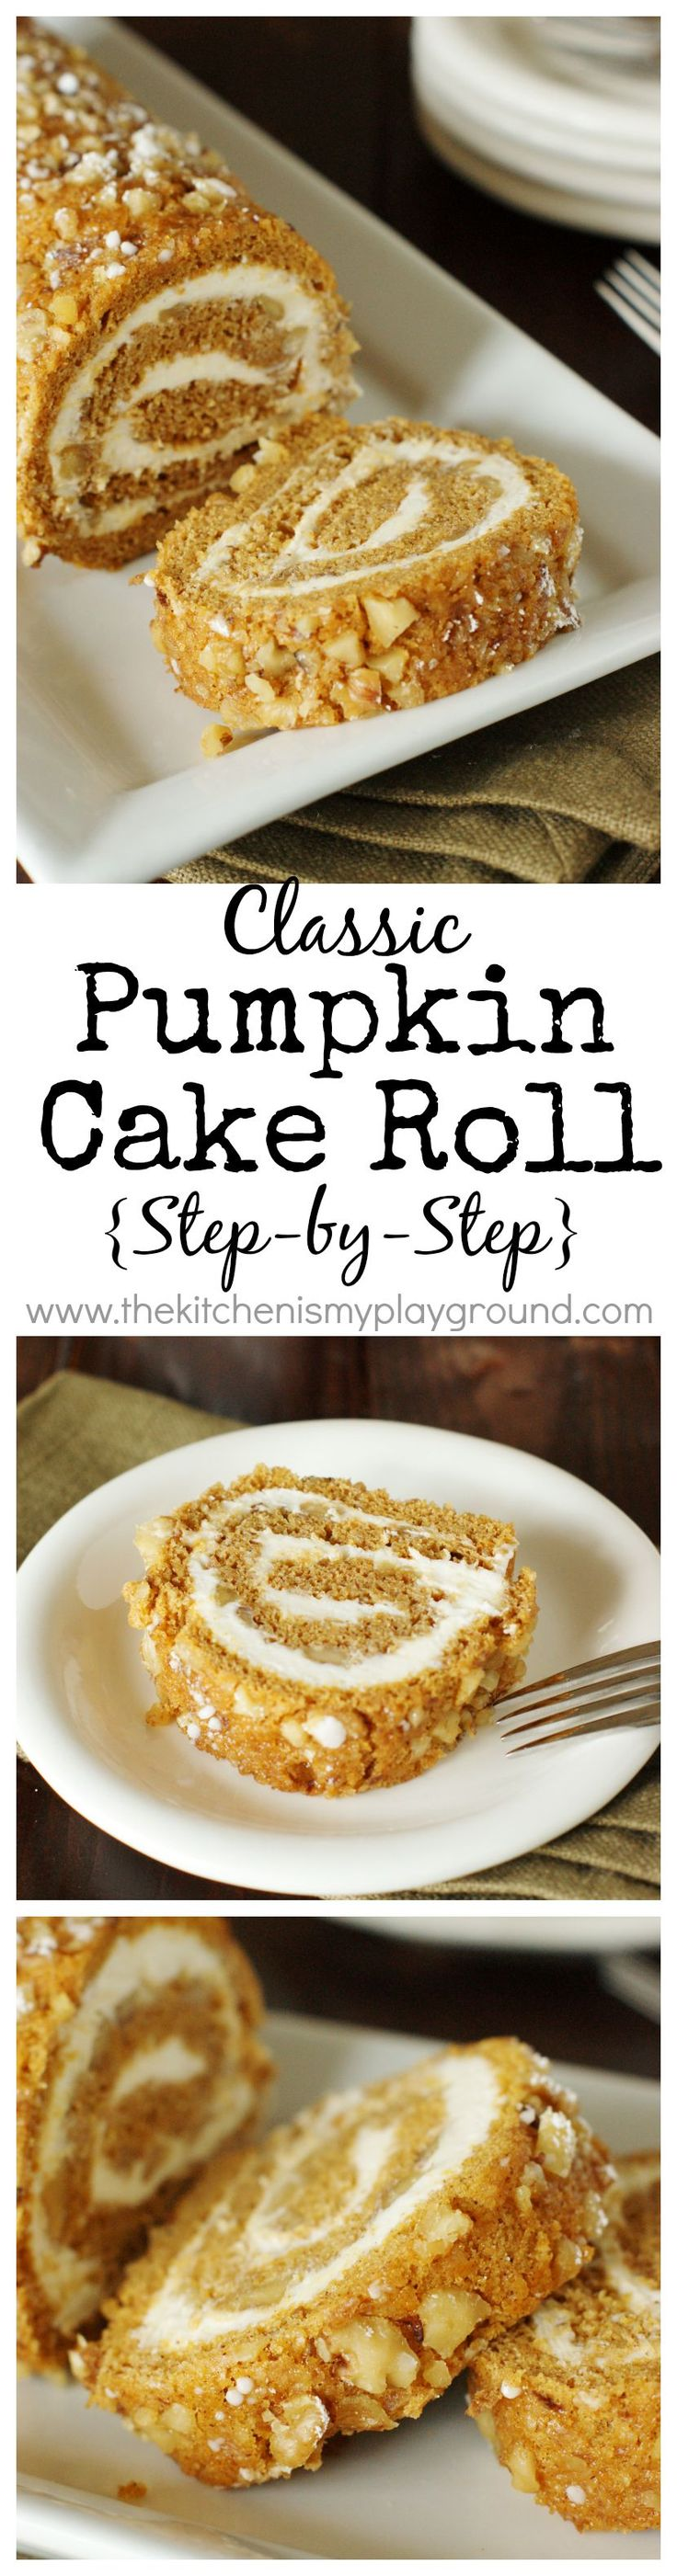 Classic Pumpkin Cake Roll ~ with step-by-step photos! www.thekitchenismyplayground.com